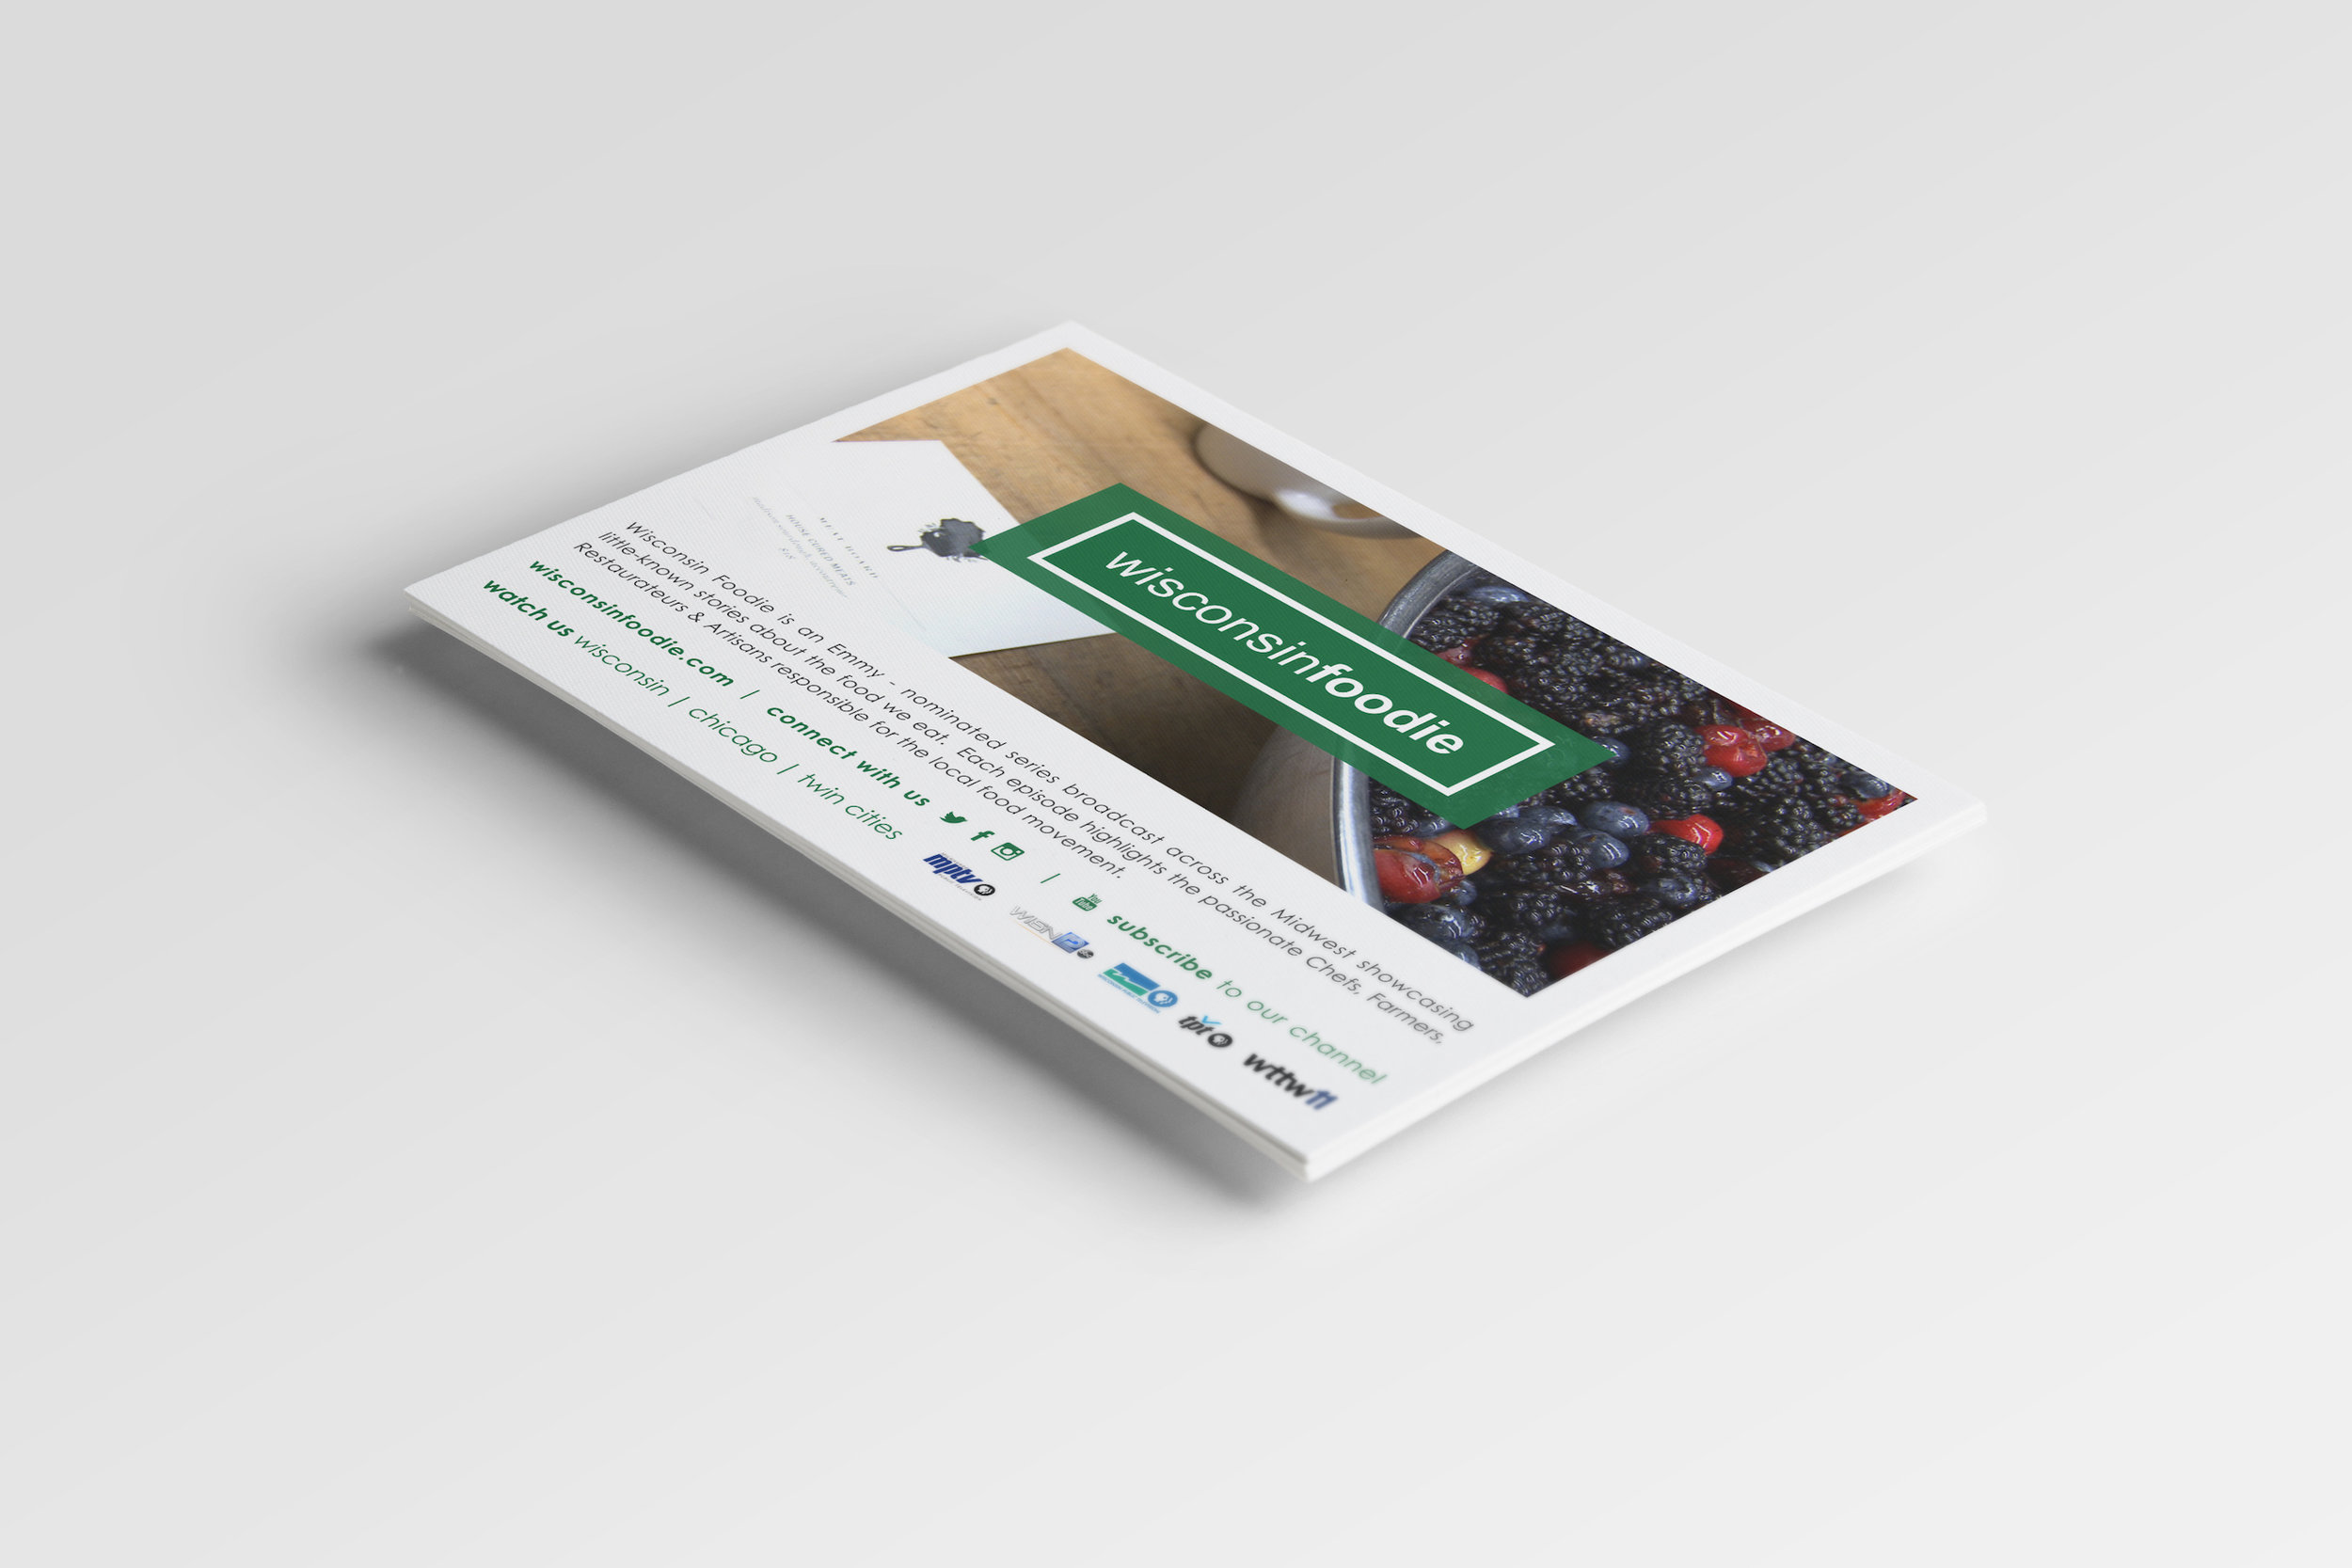 Golden-Antler-Design-Milwaukee-Web-Branding-Marketing-Wisconsin-Foodie-Edible-Milwaukee-Postcard-Printing-Order